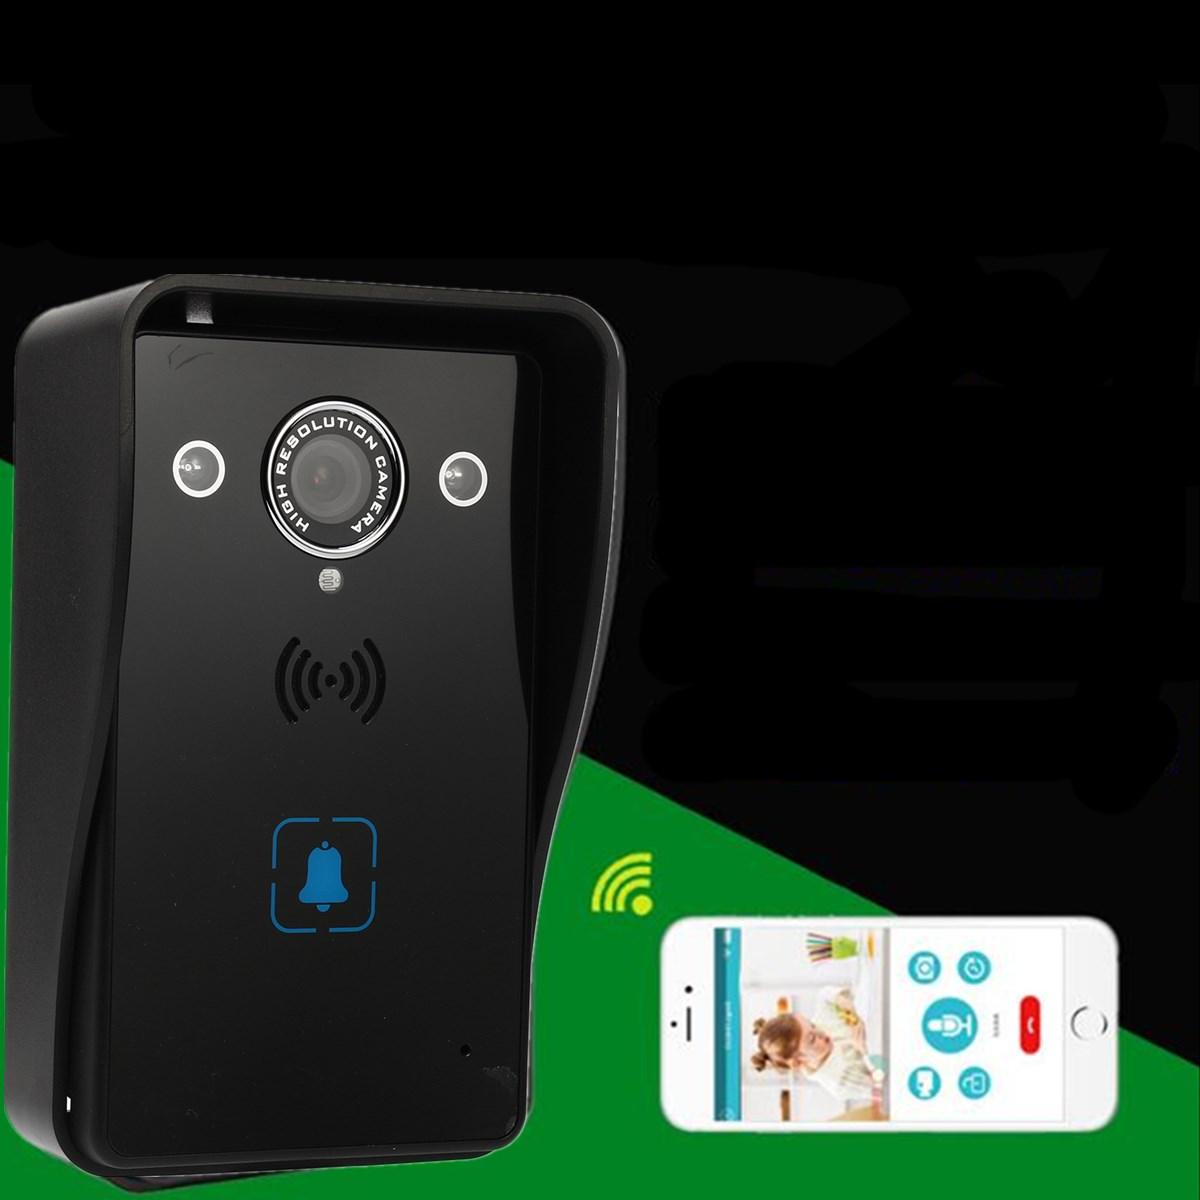 Wireless WiFi Video Door Bell Phone Doorbell Remote Phone Intercom IR Night Vision